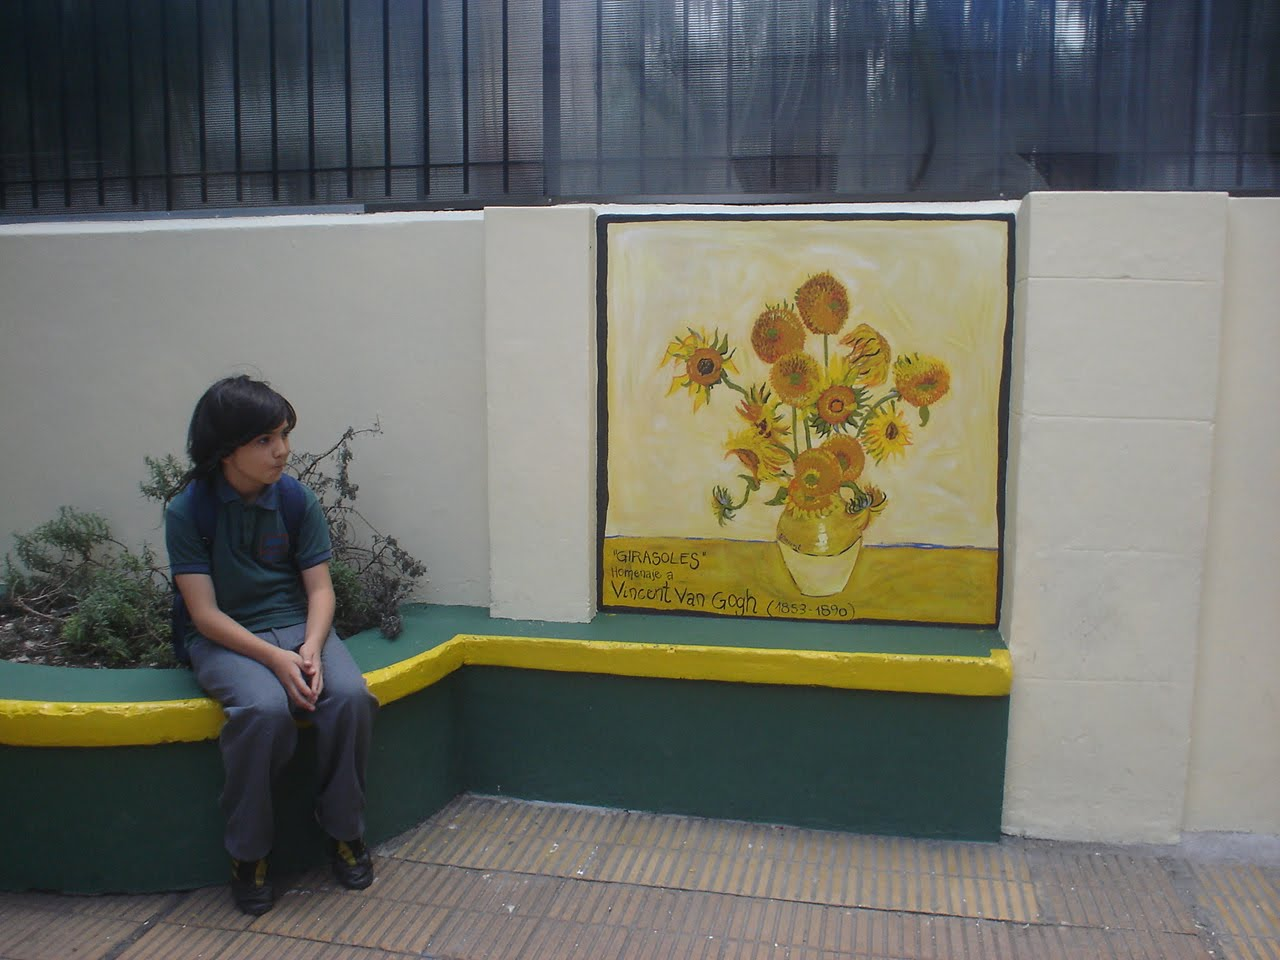 Murales mural en colegio sarmiento homenaje a van gogh for 9 11 mural van